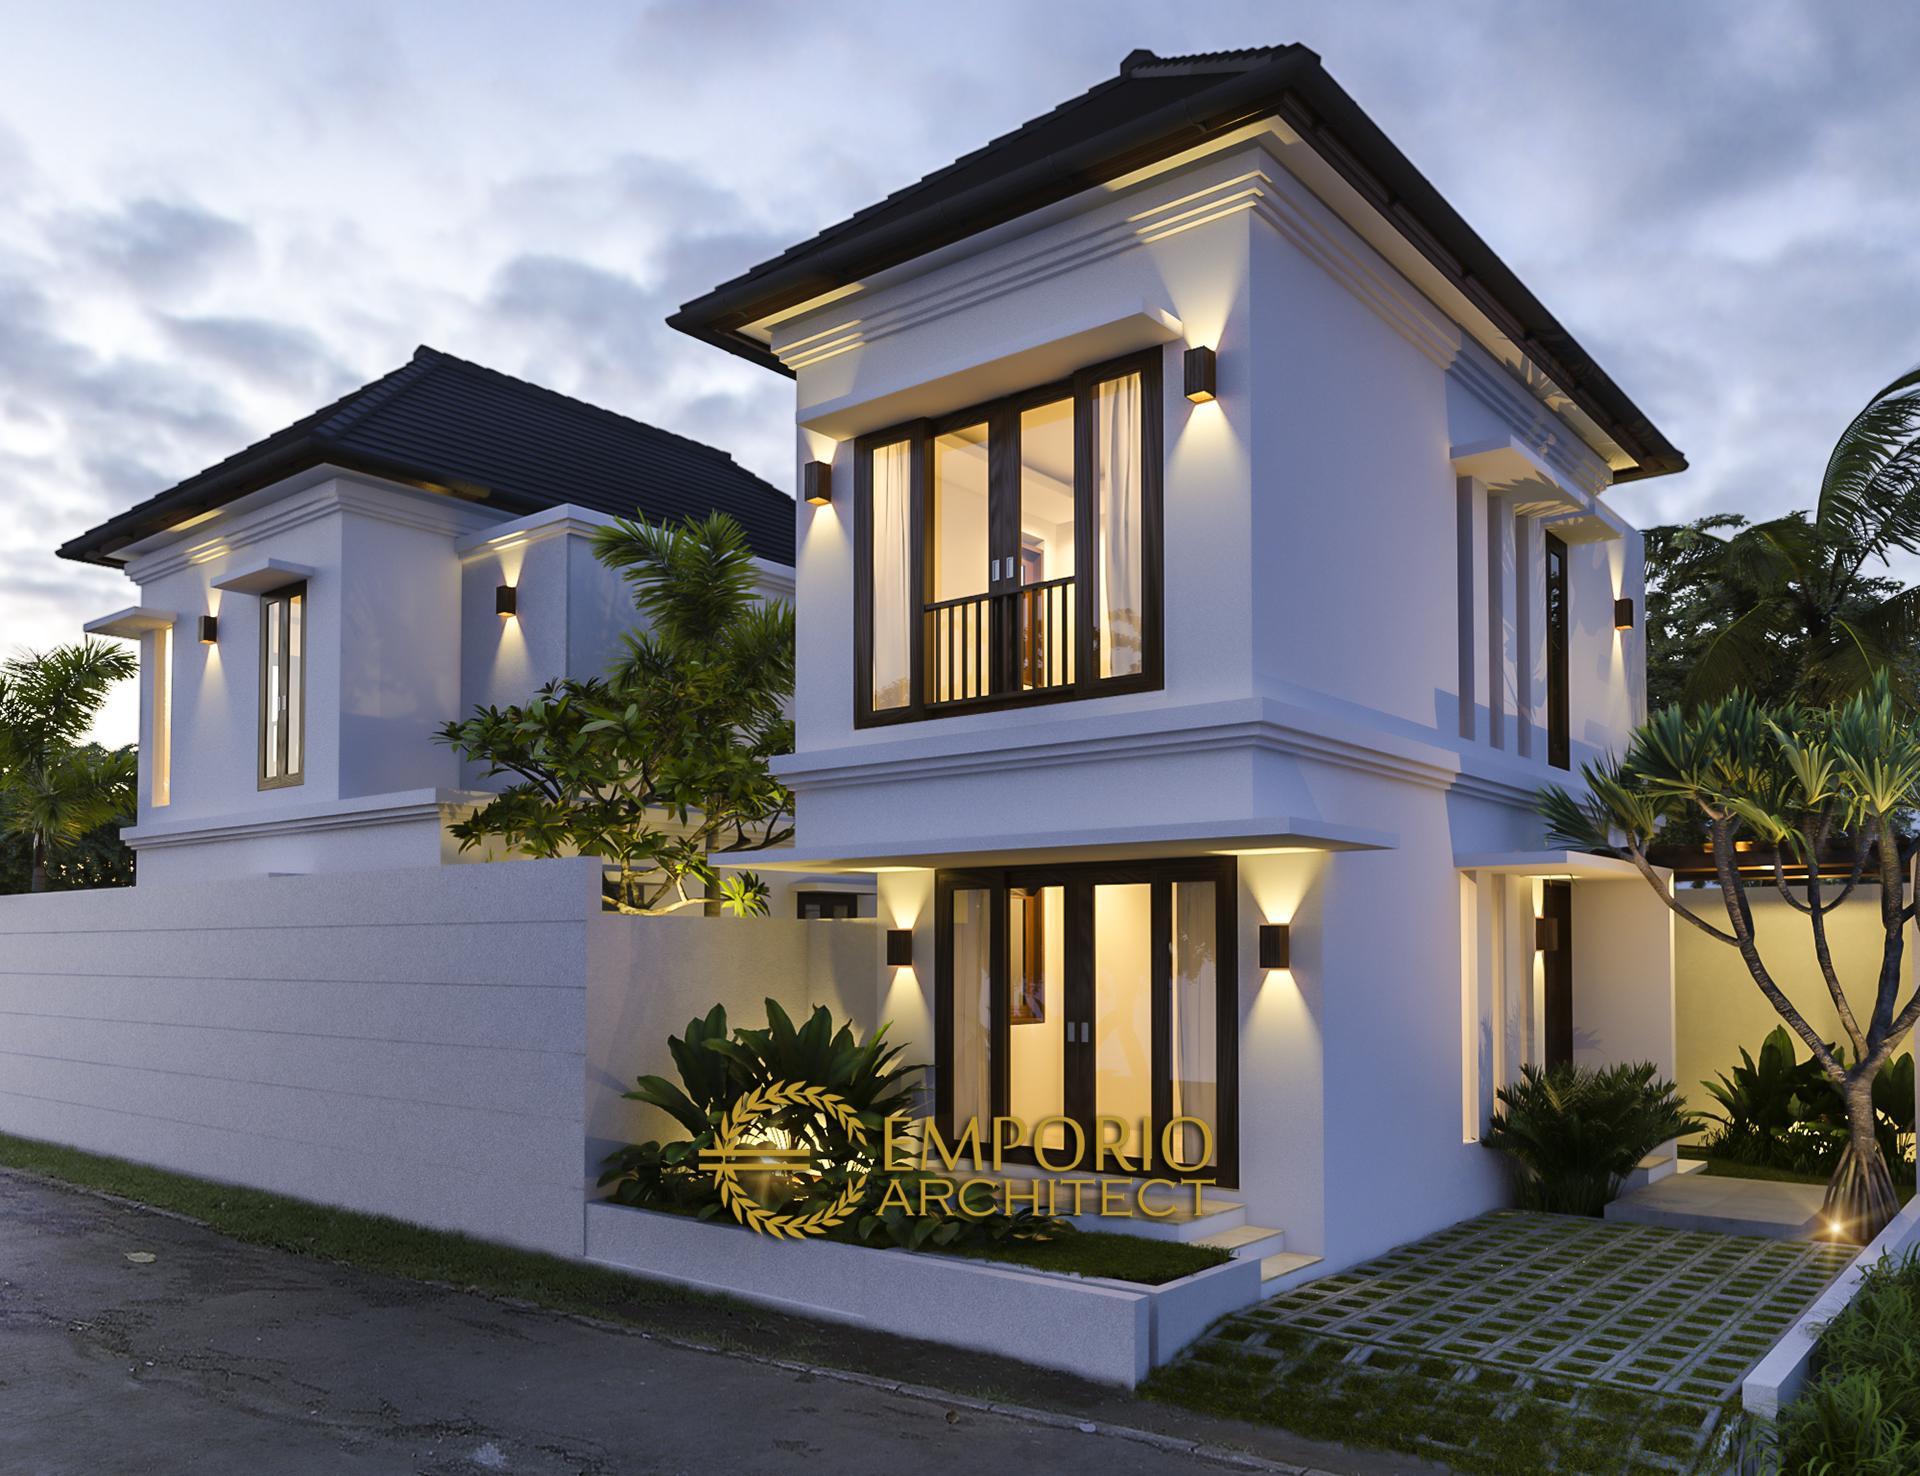 Desain Rumah Villa Bali 2 Lantai Ibu Wiwit di  Jimbaran